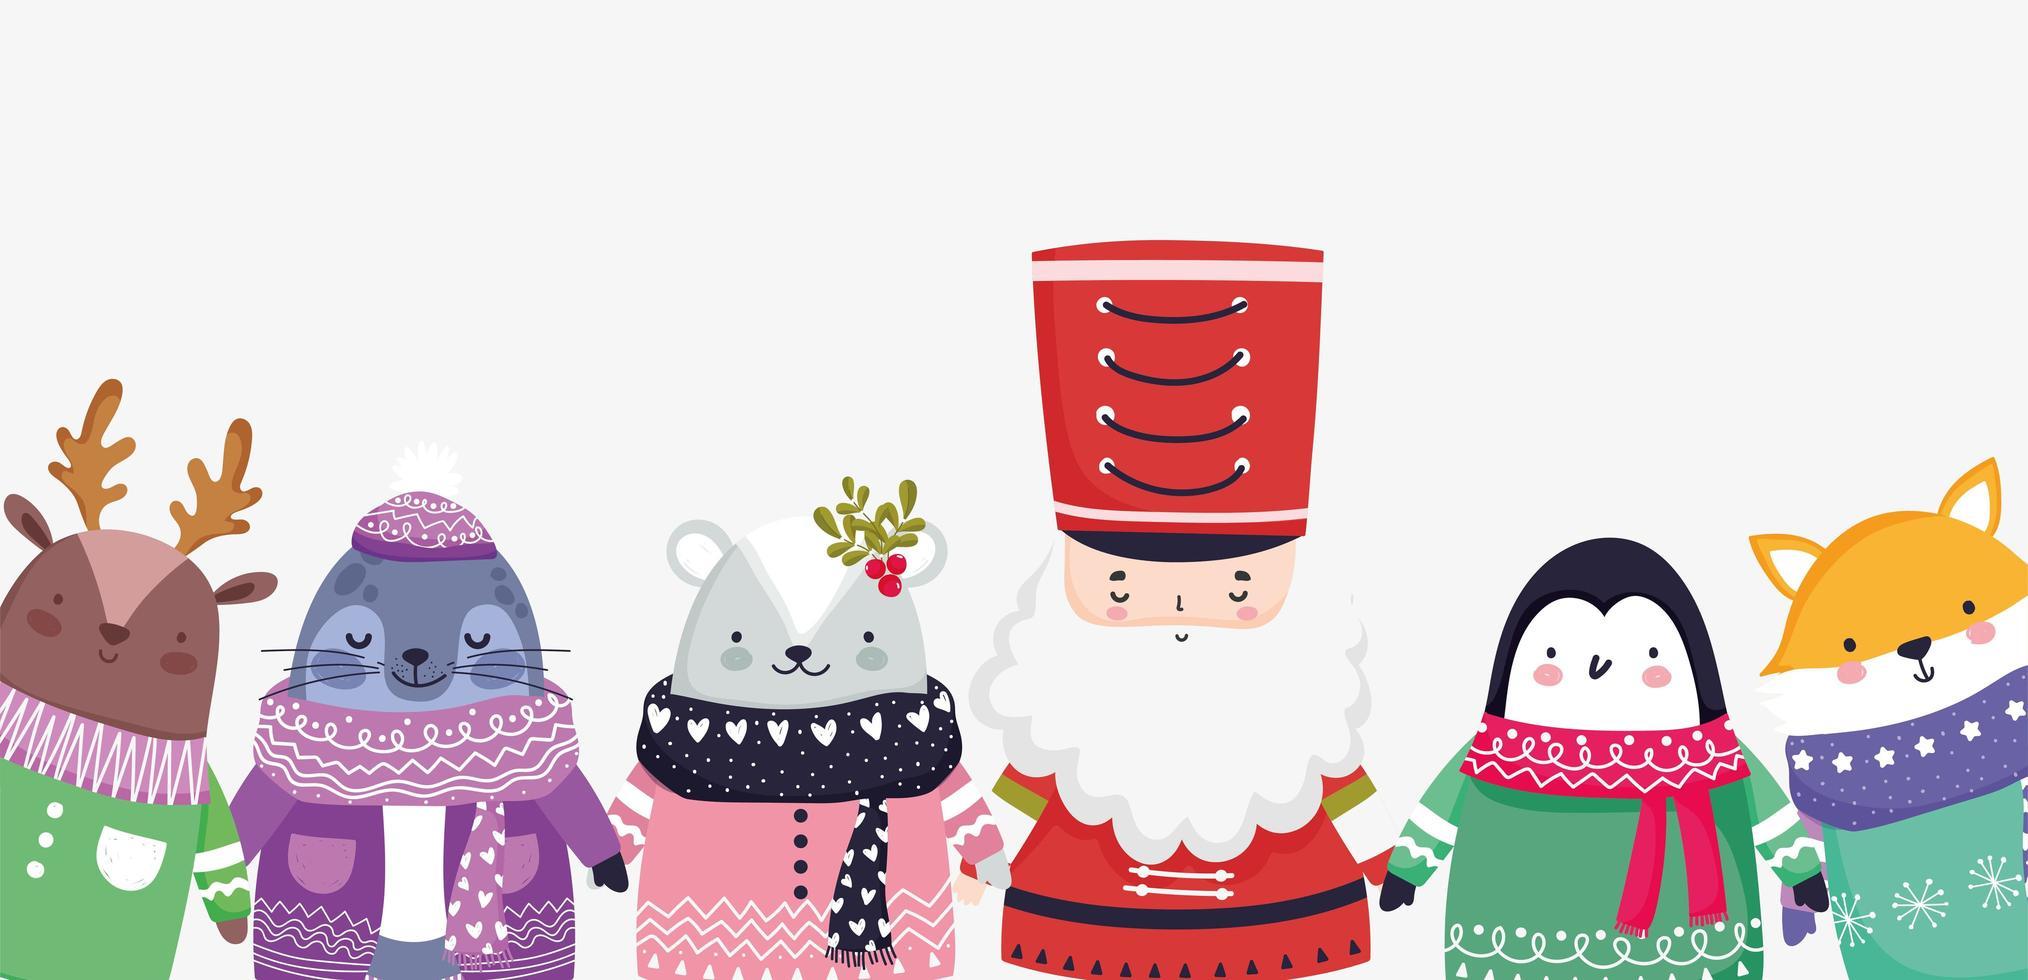 god jul affisch med glada karaktärer vektor